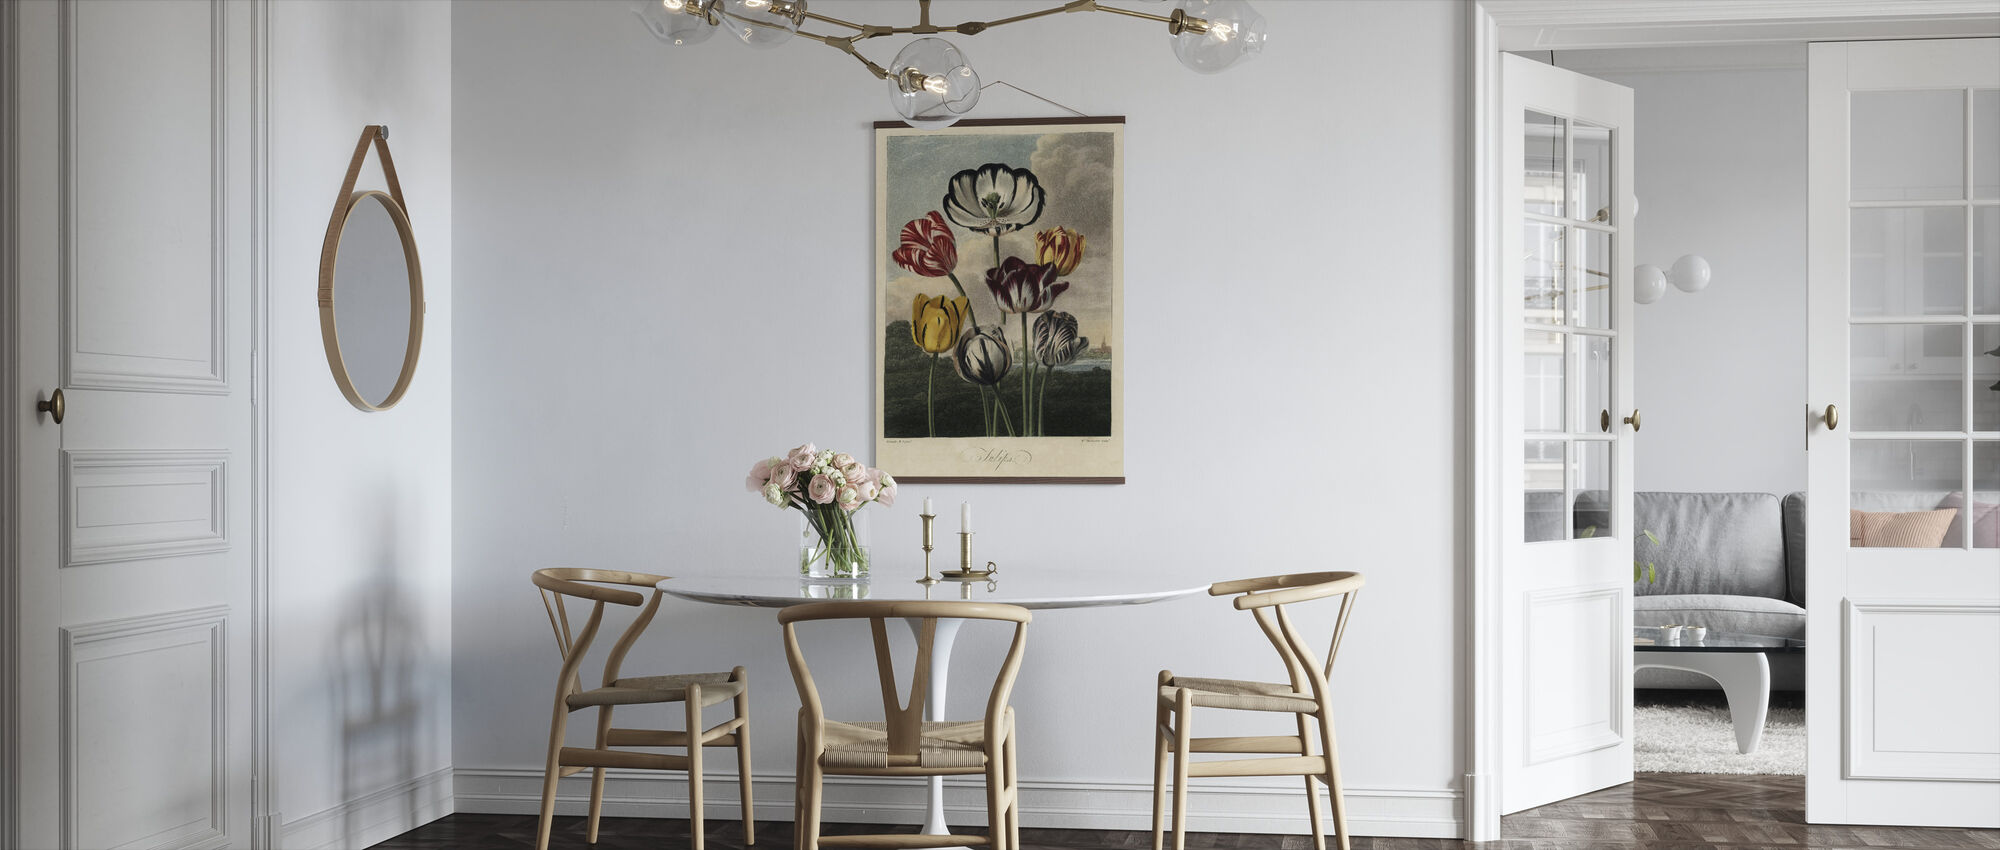 Tulip sorter - Poster - Kök